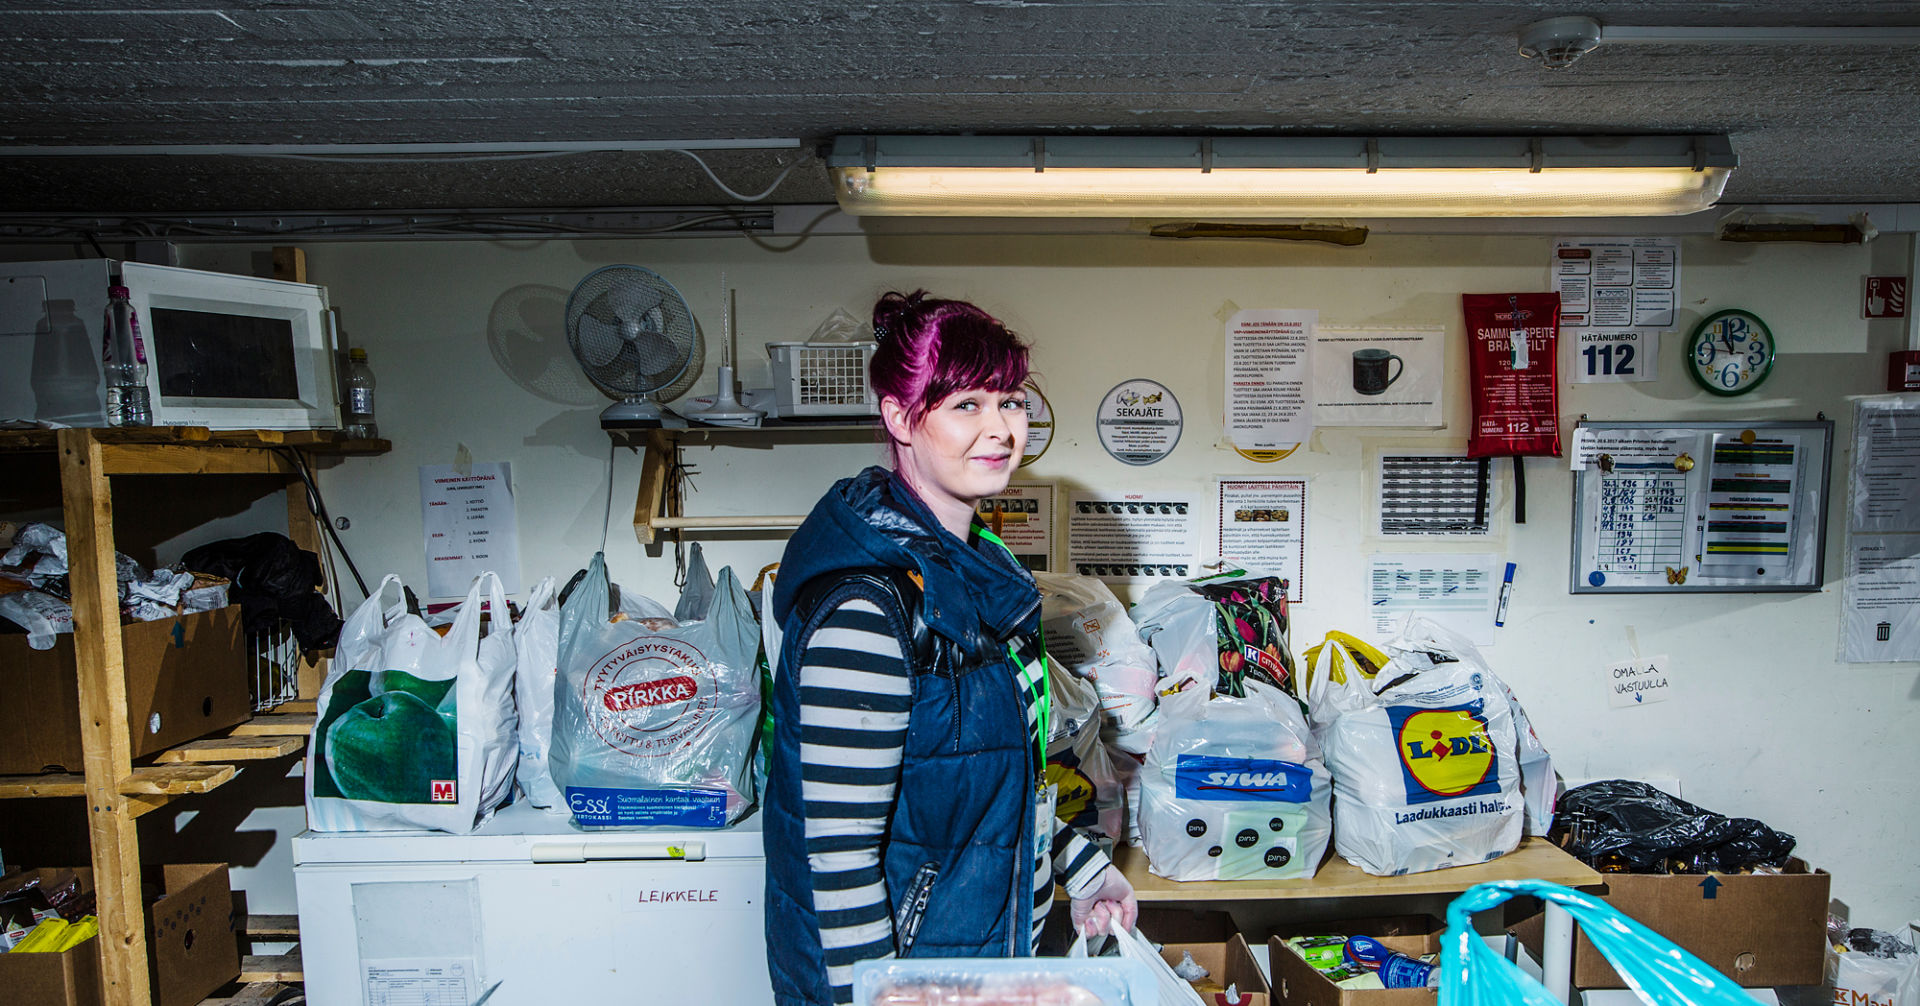 Nuori nainen lajittelee ruoka-apua